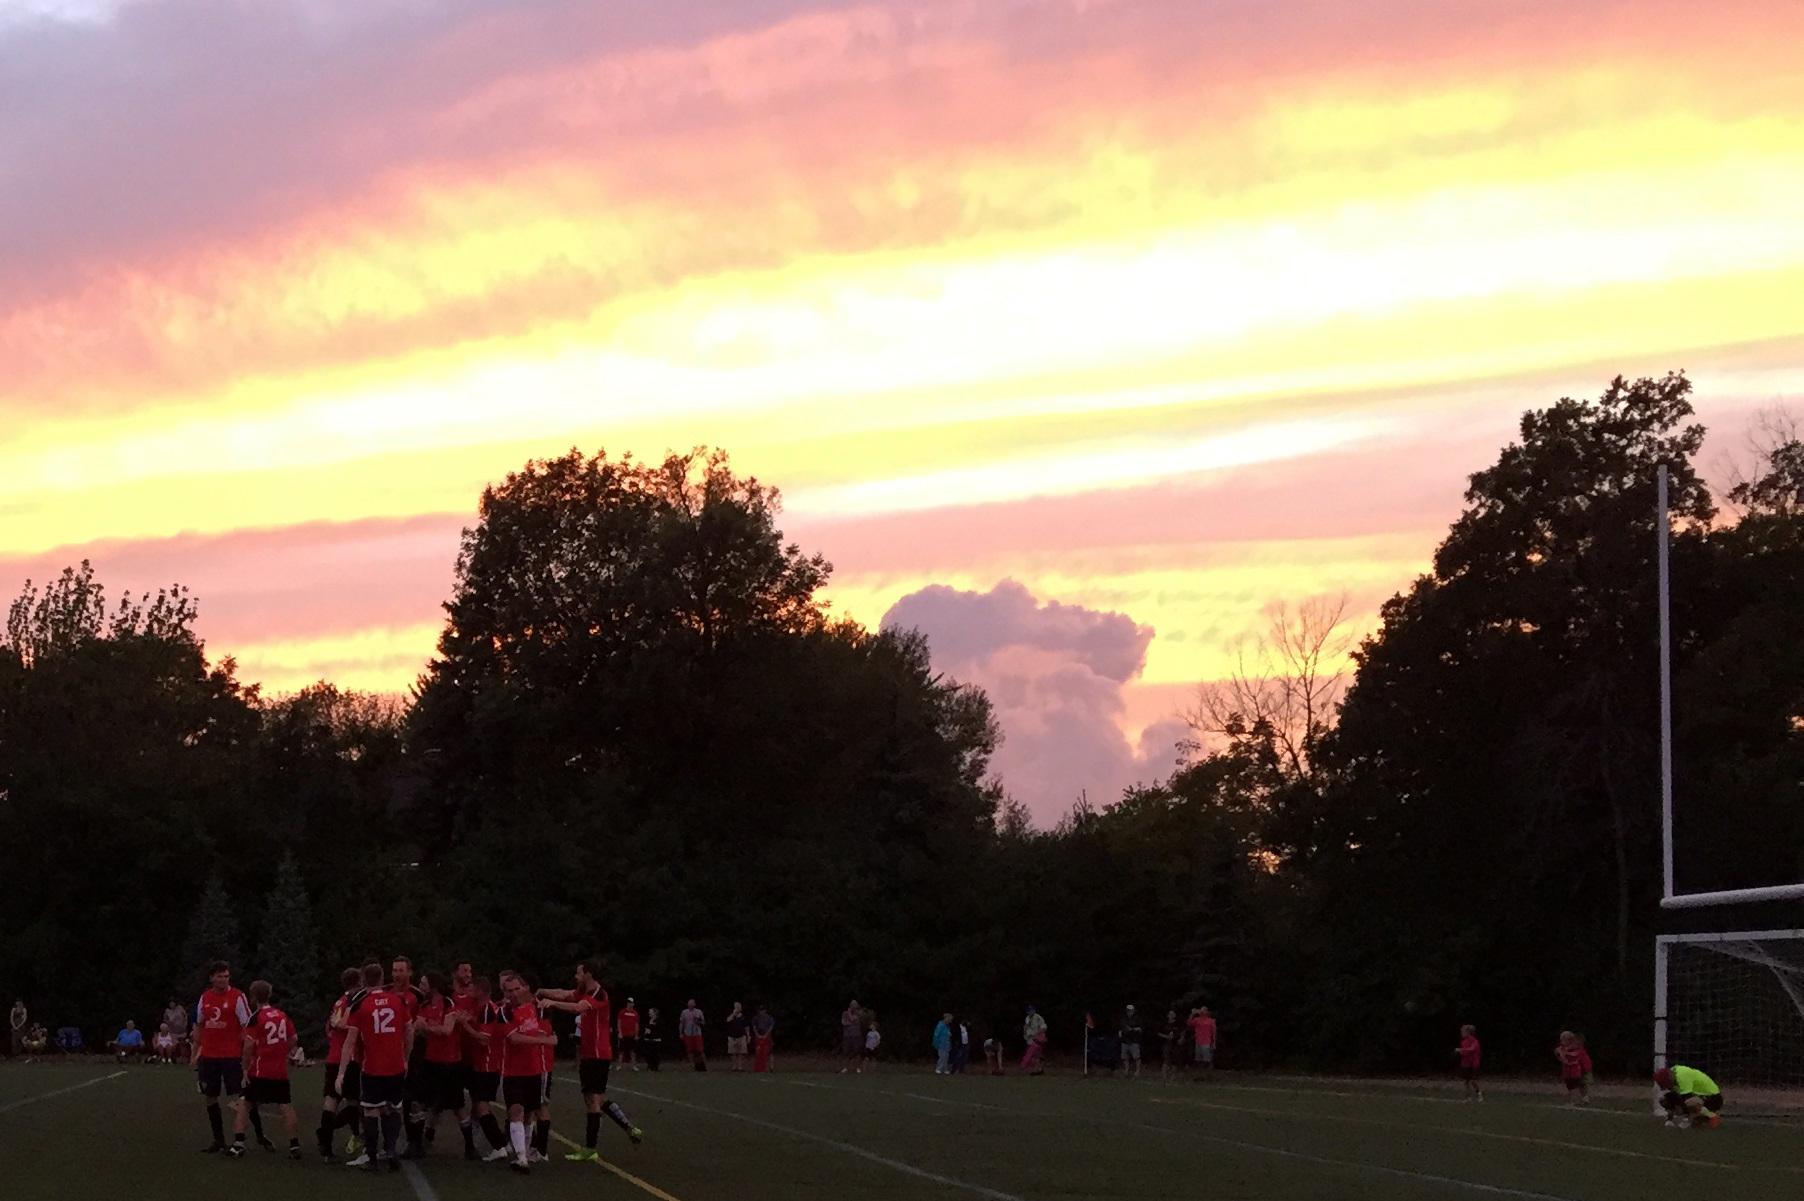 Sharpshooters celebrate their title win as the sun sets. (Ben Tsujimoto/Buffalo News)